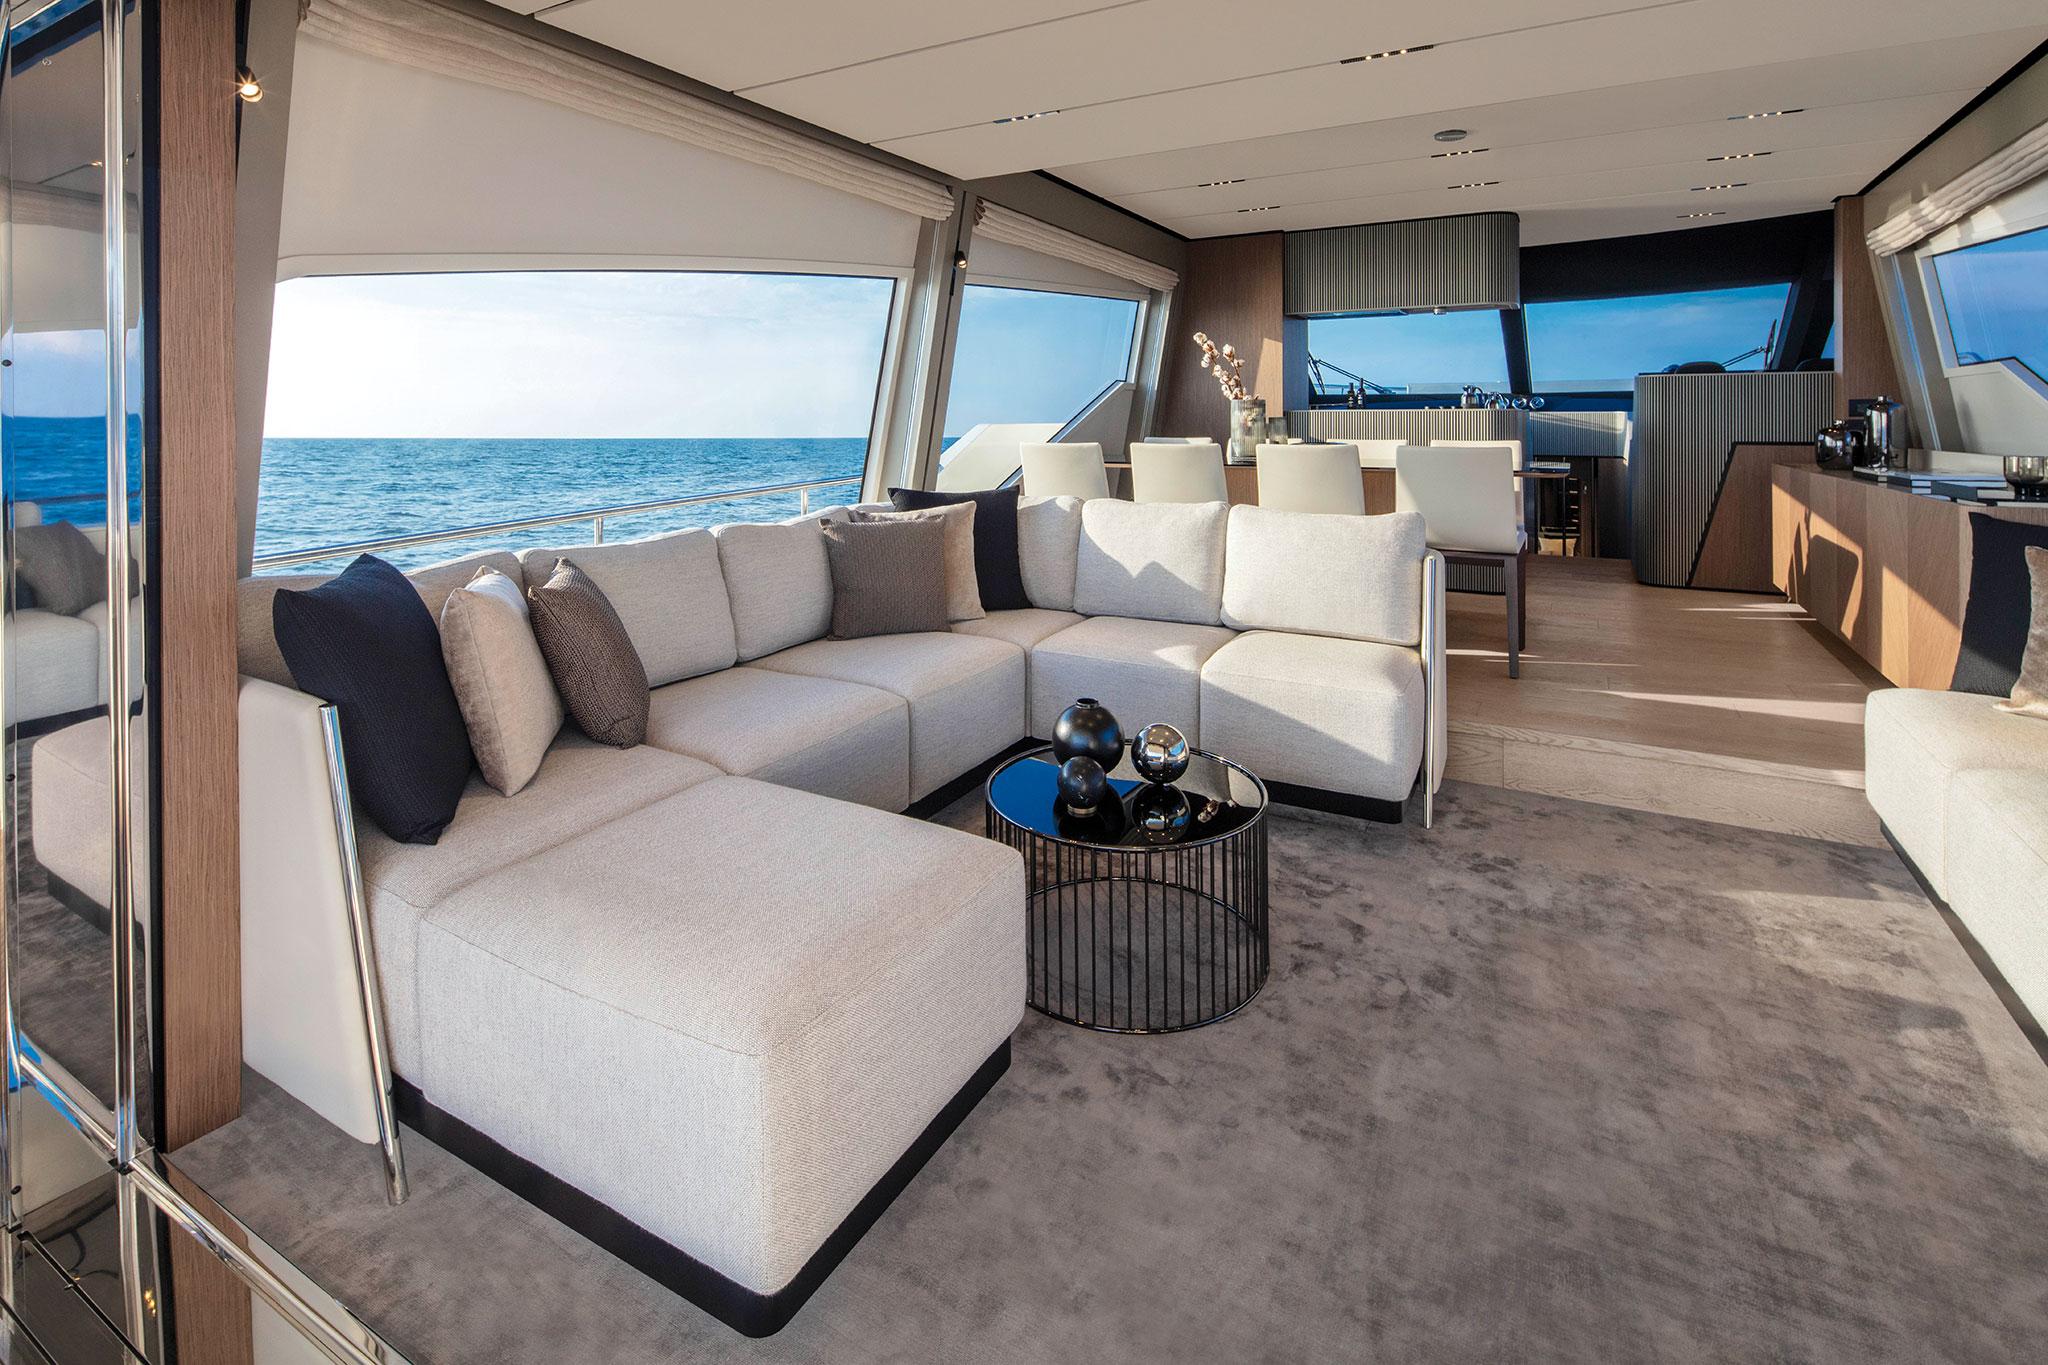 ferretti-Yachts-720-salon_1-yachts-france-173